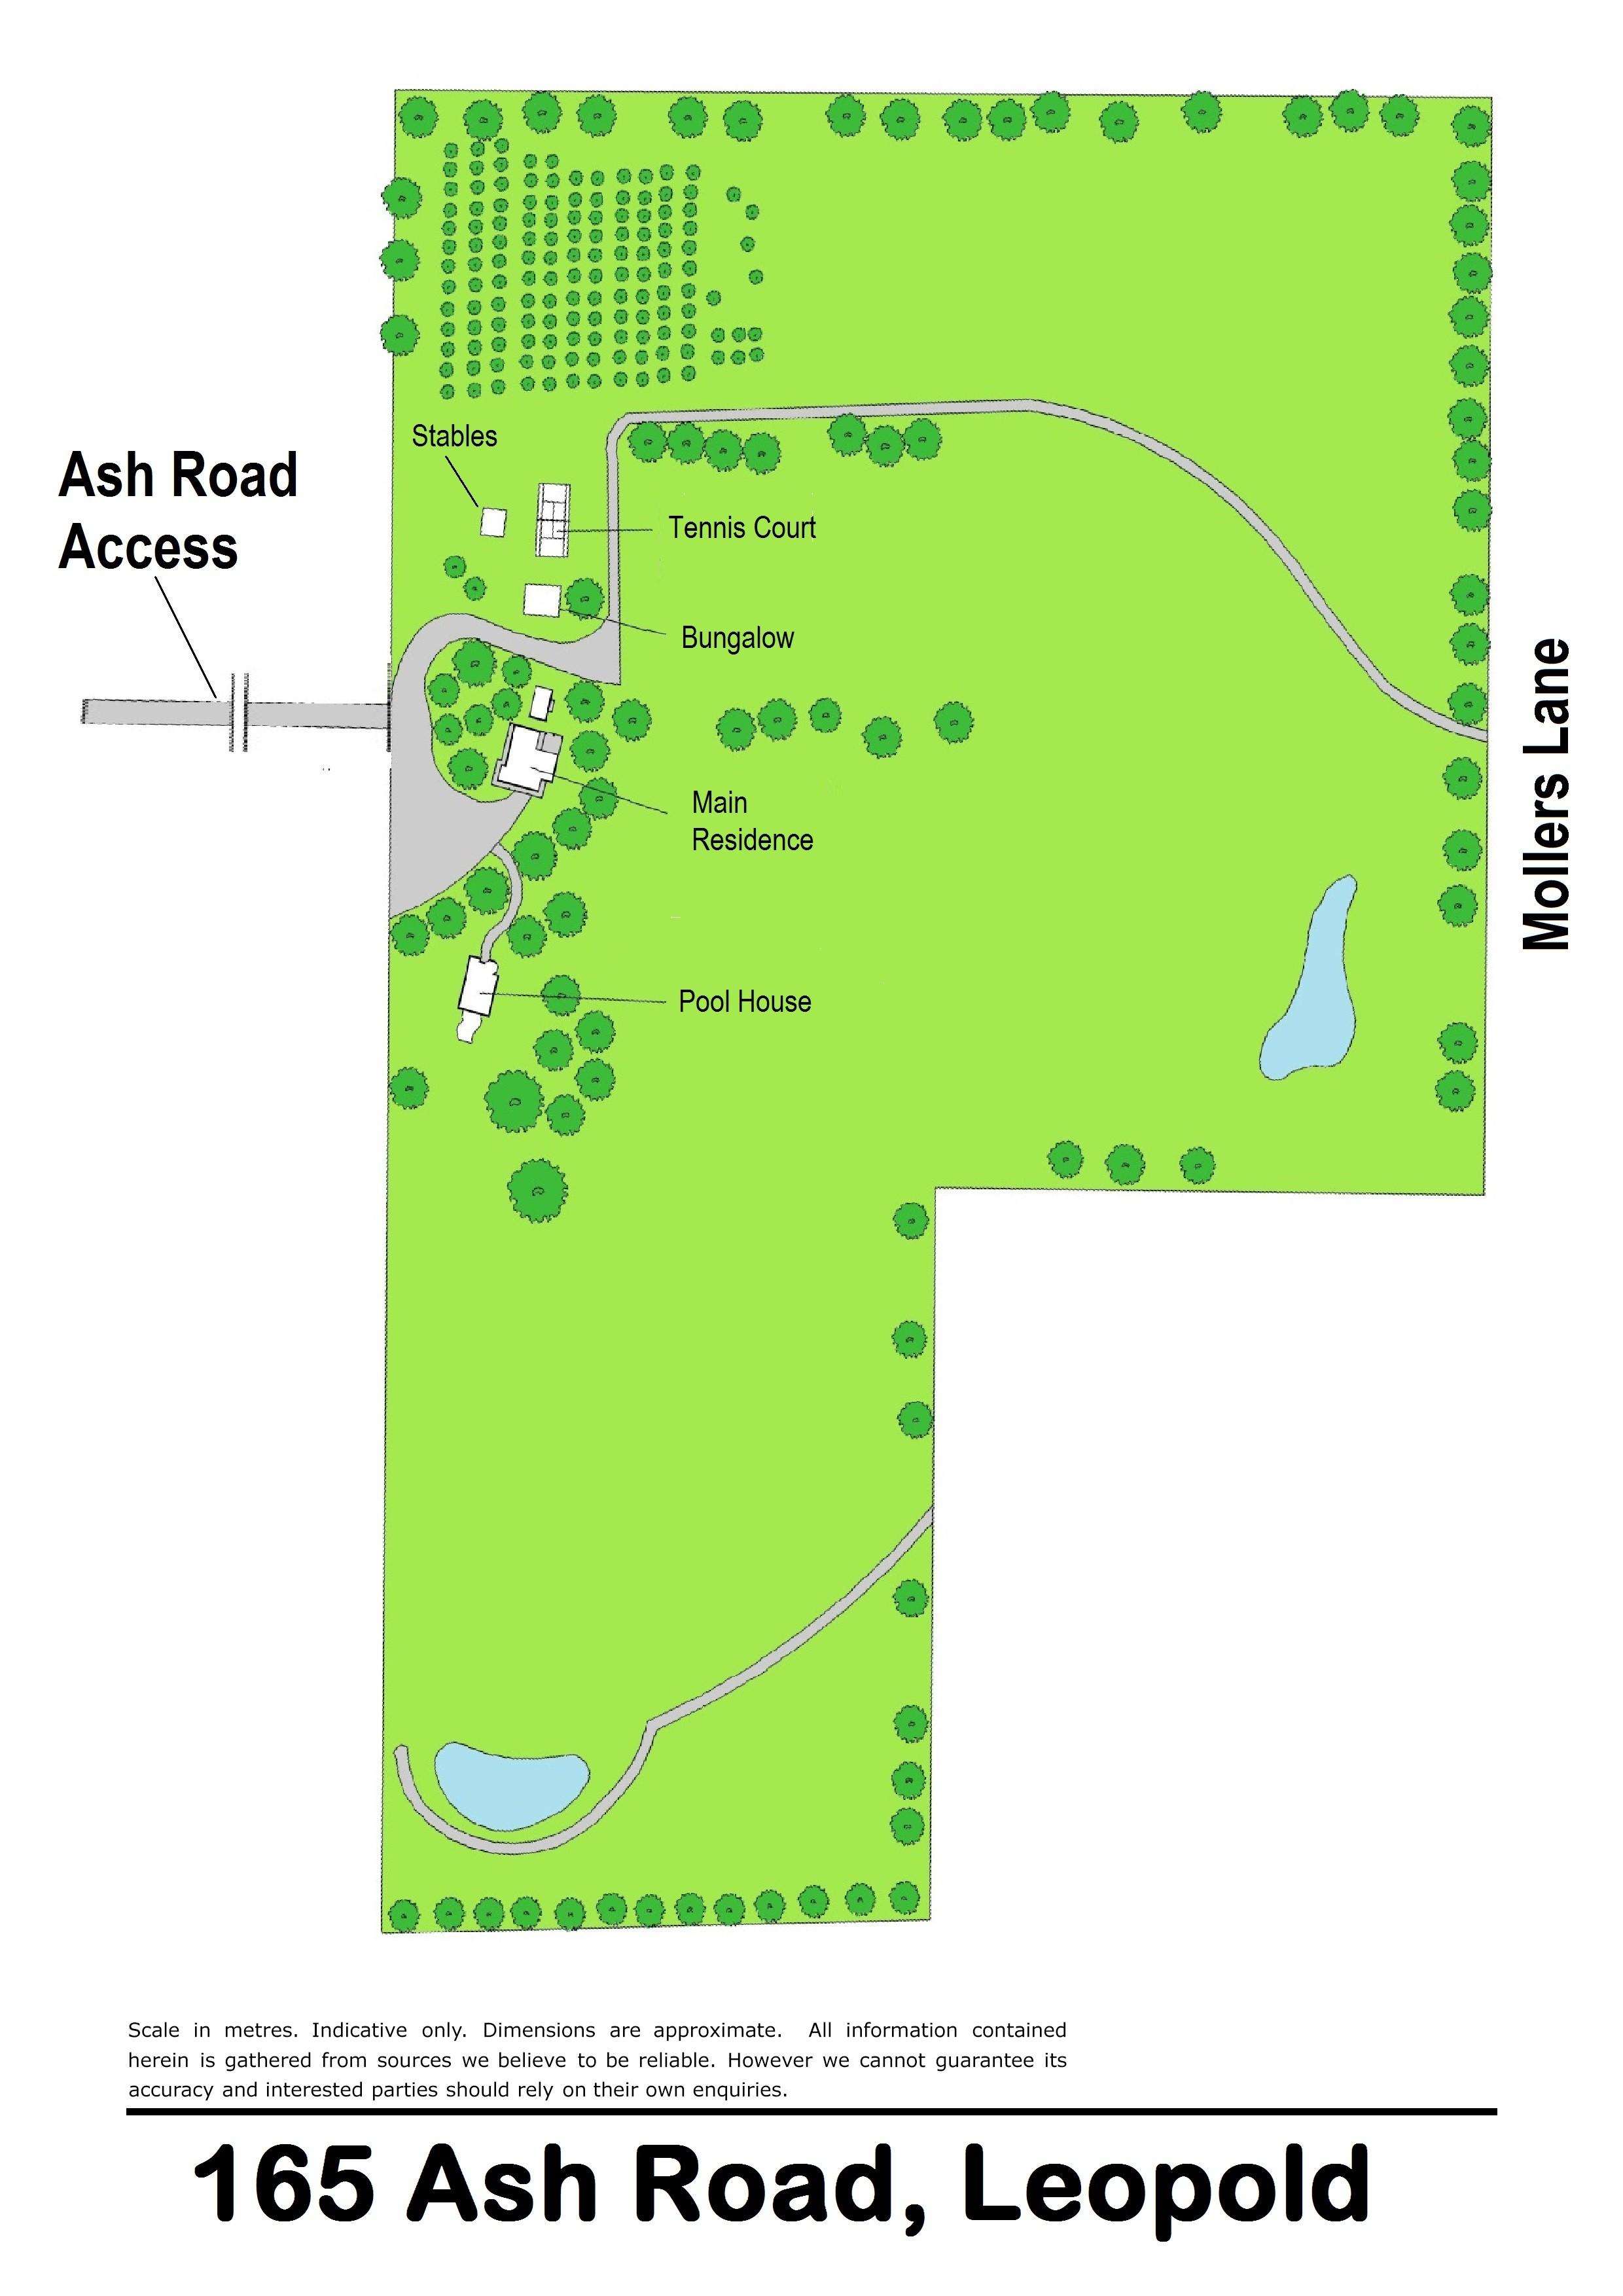 185 Ash Road Leopold